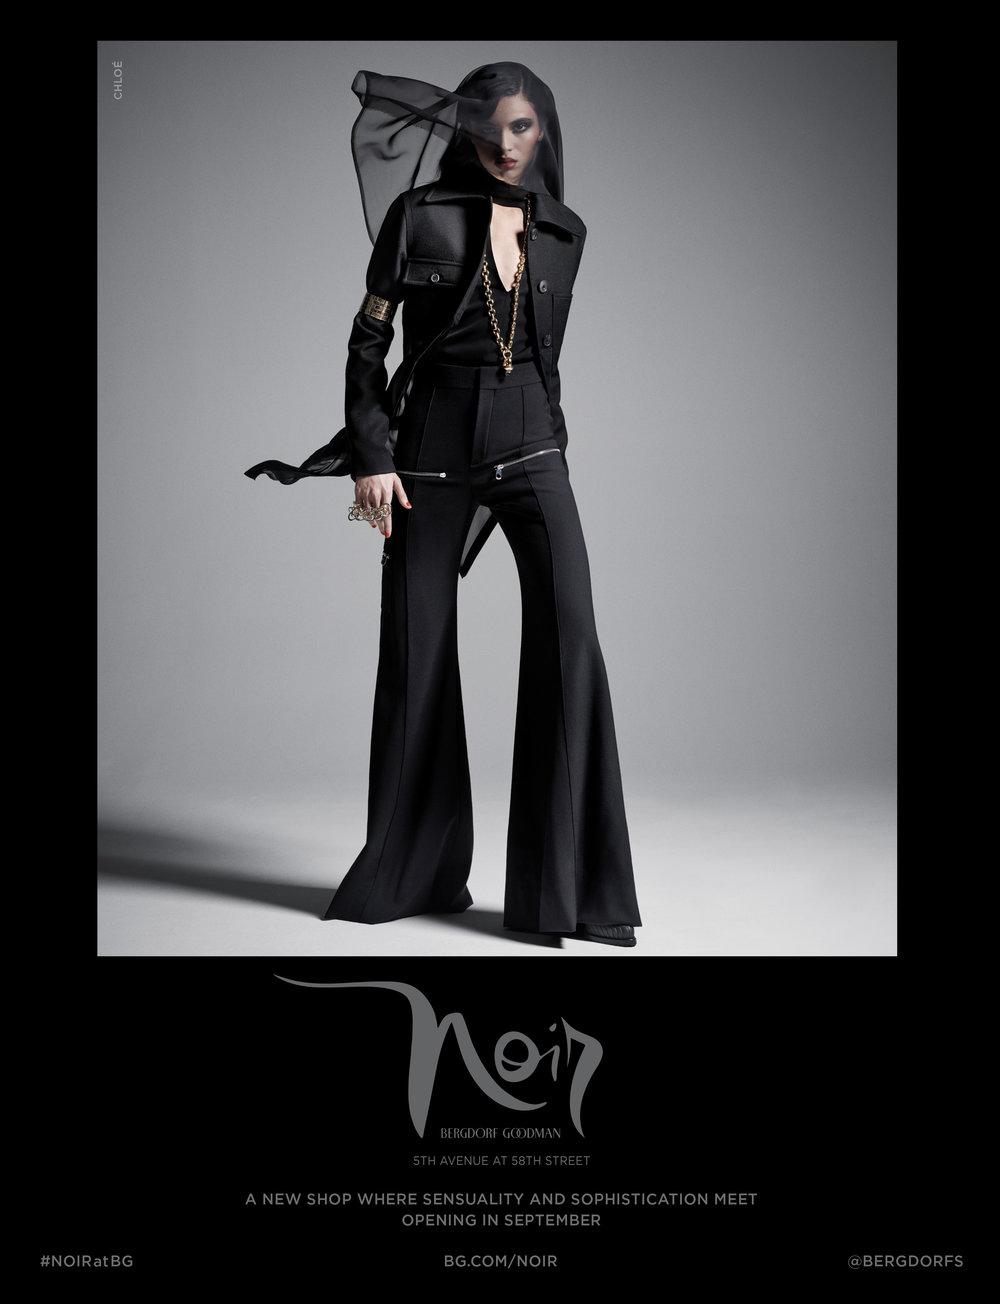 "Noir campaign advertisement for  Cabana 's Fall/Winter Issue. 9.2 x 12"". Design. Creative Director Katia Kuethe, Photographer Paola Kudacki, Fashion Editor Anne Christensen."